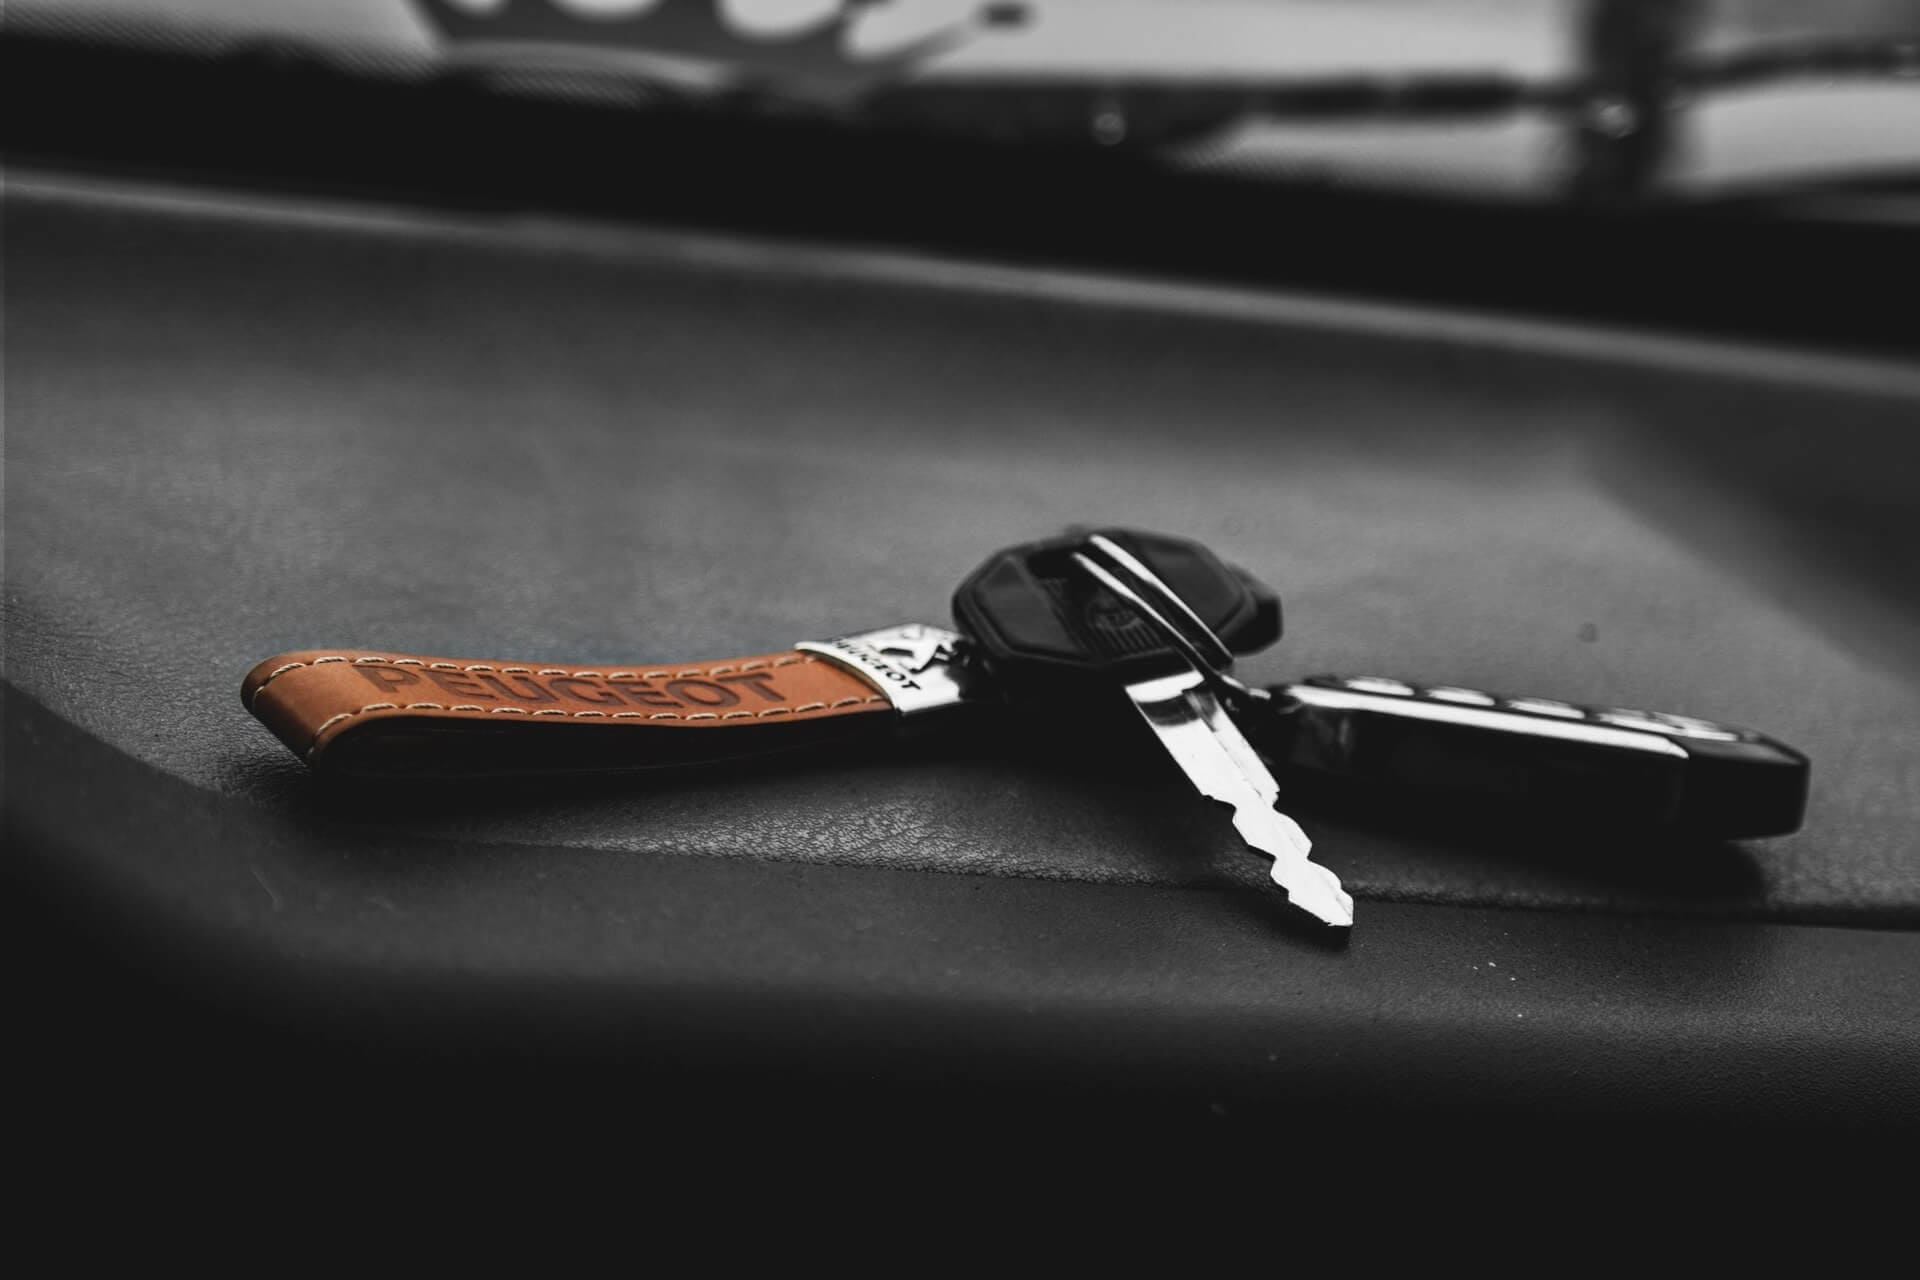 Test Driving The Azure Key Vault Client Samples